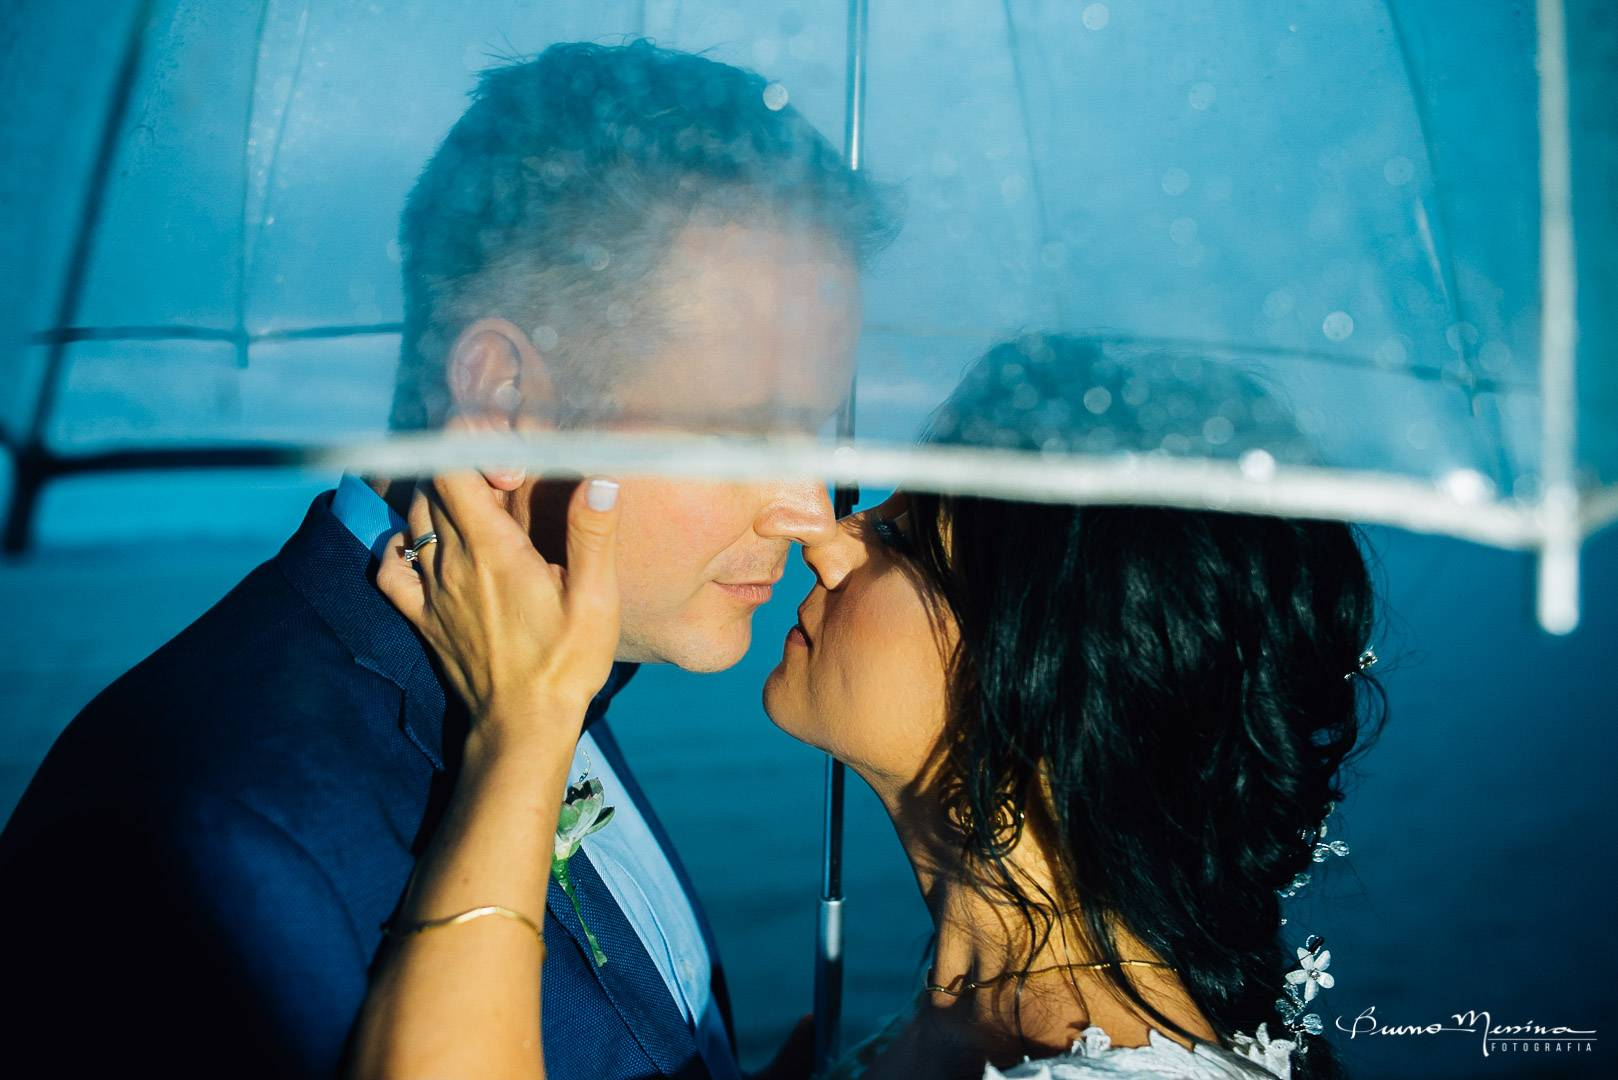 casamento-ao-ar-livre-casamento-na-praia-fotos-casamento-de-dia64